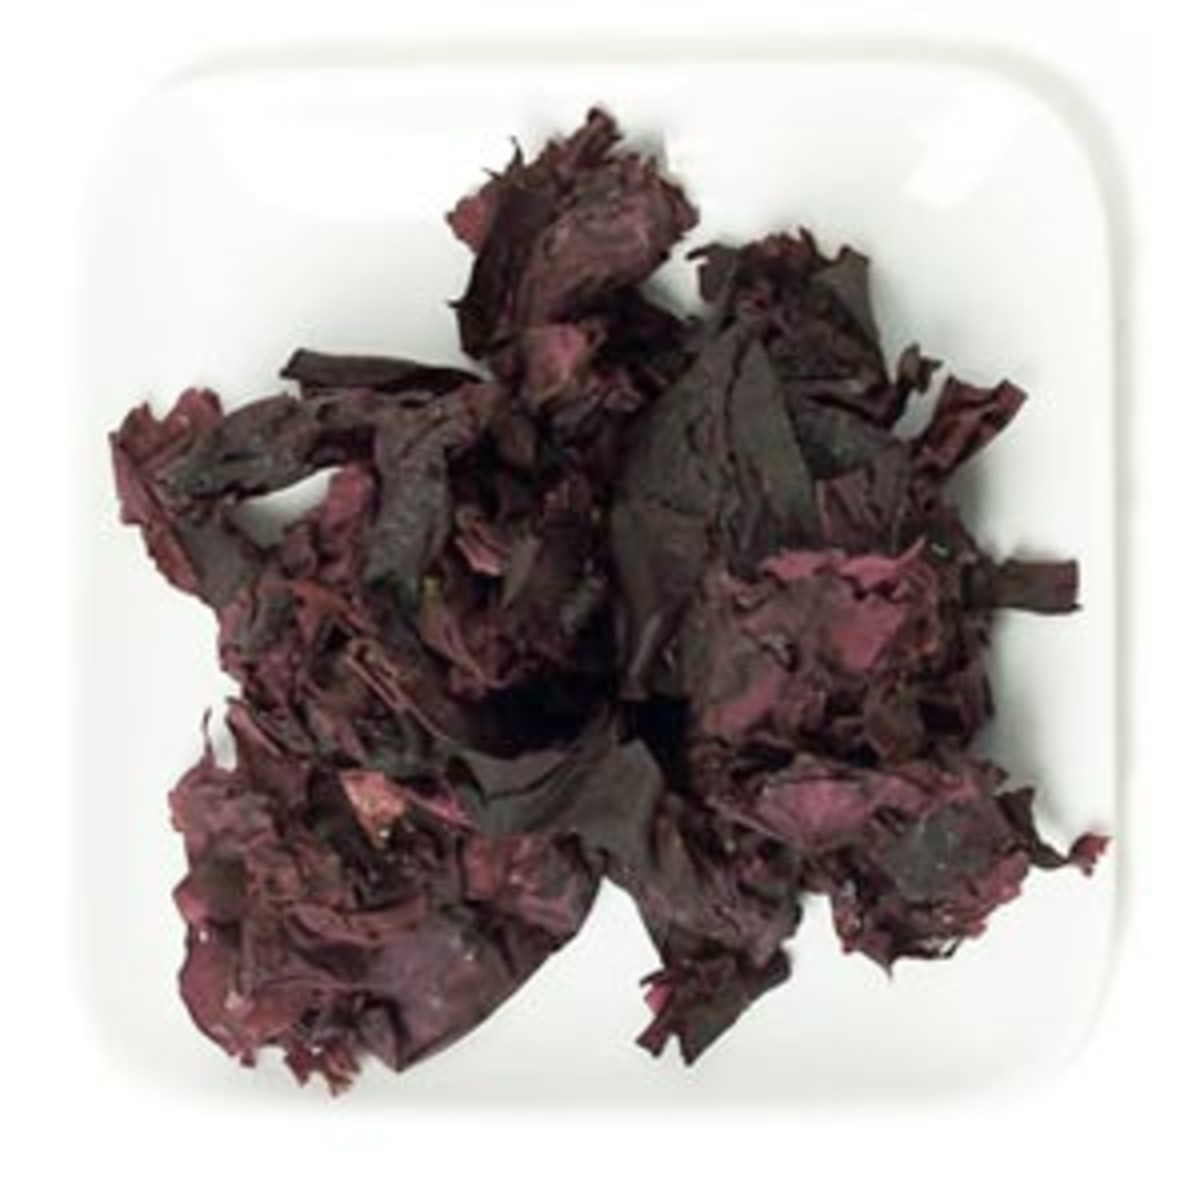 Dulse, a seaweed for snacks & salads